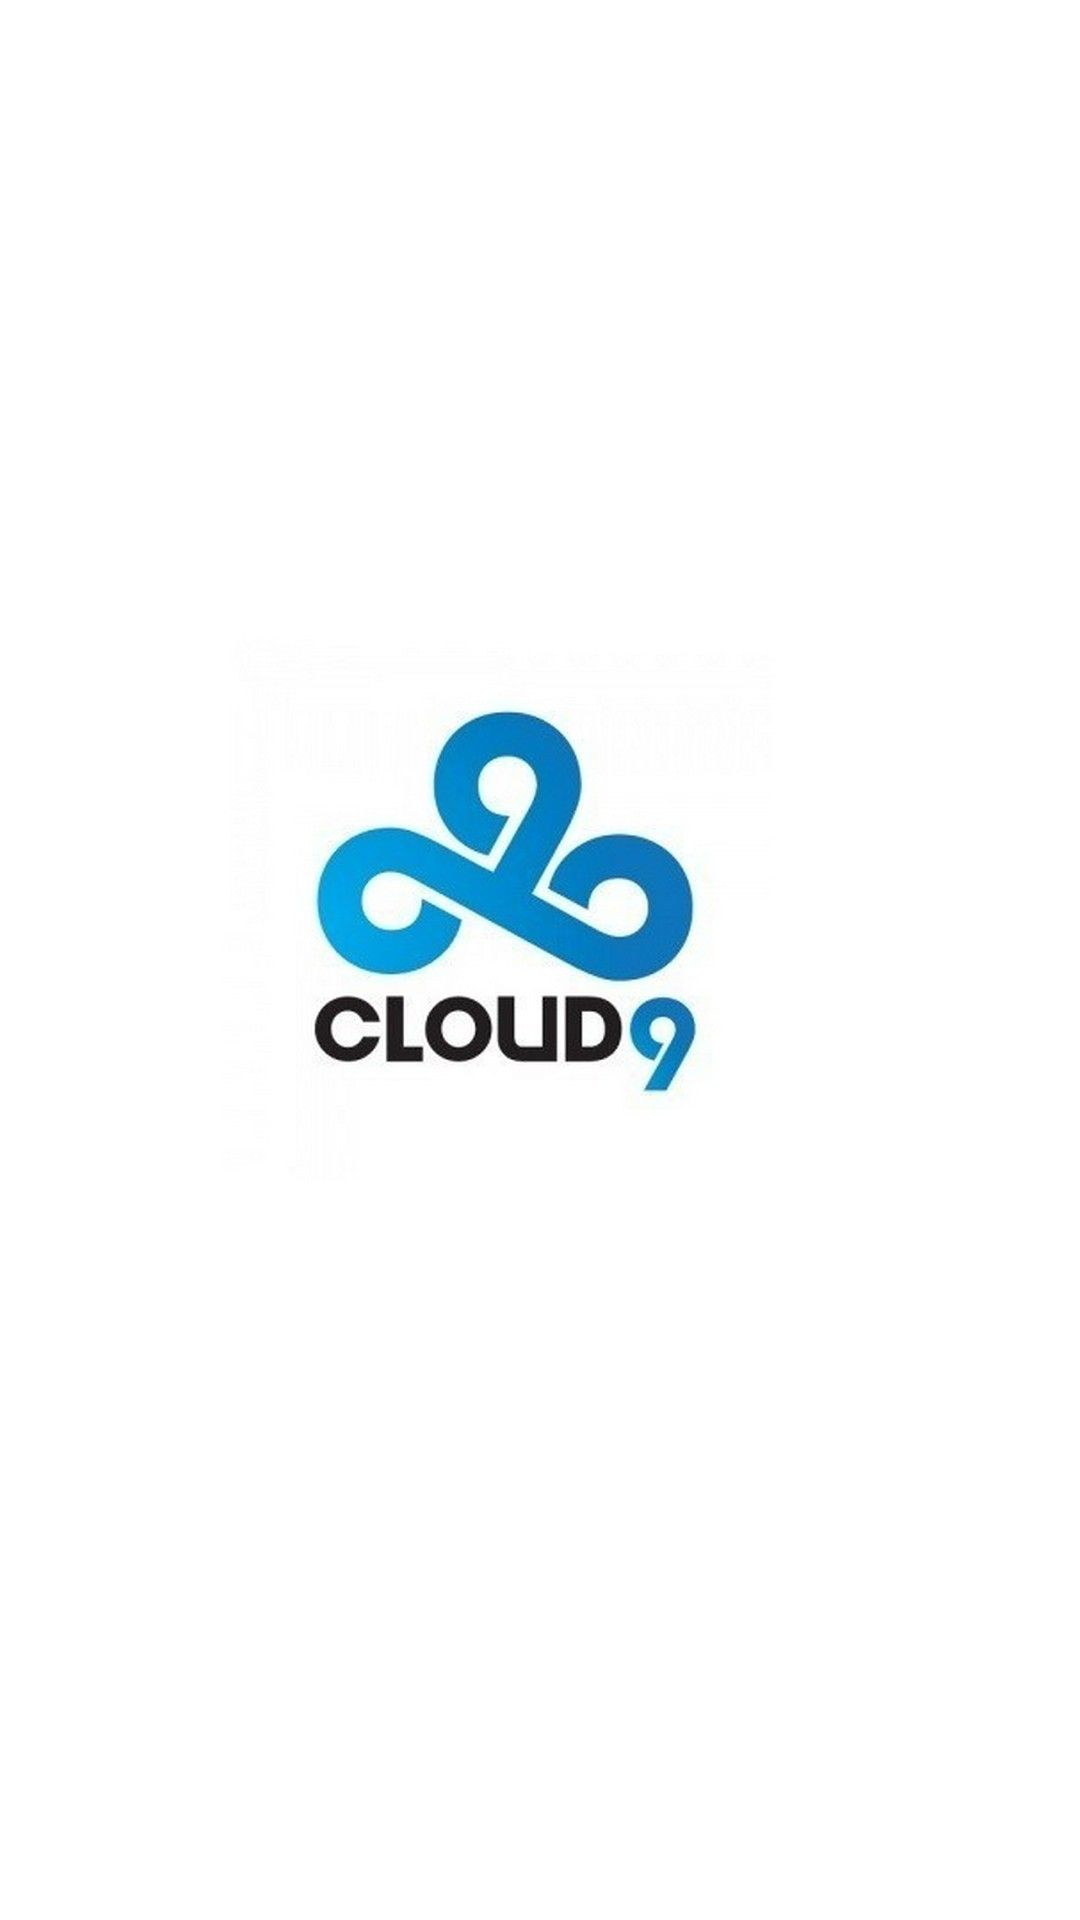 Cloud 9 Wallpaper For Lock Screen Papeis De Parede Naruto Desenho Celular